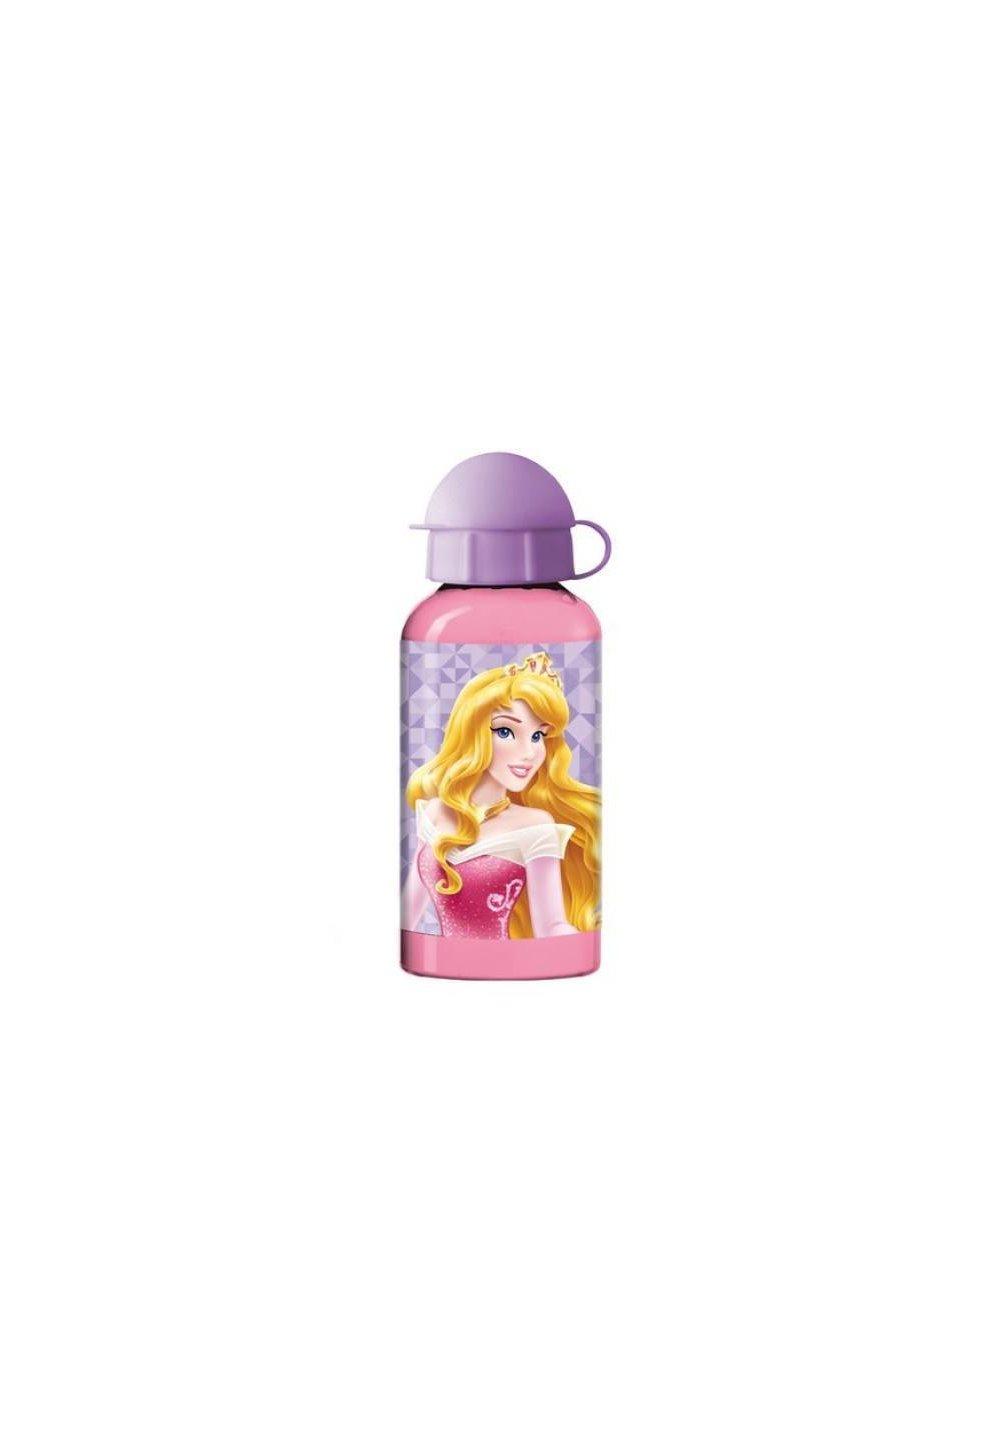 Sticla de aluminiu 400 ml, Princess, roz imagine